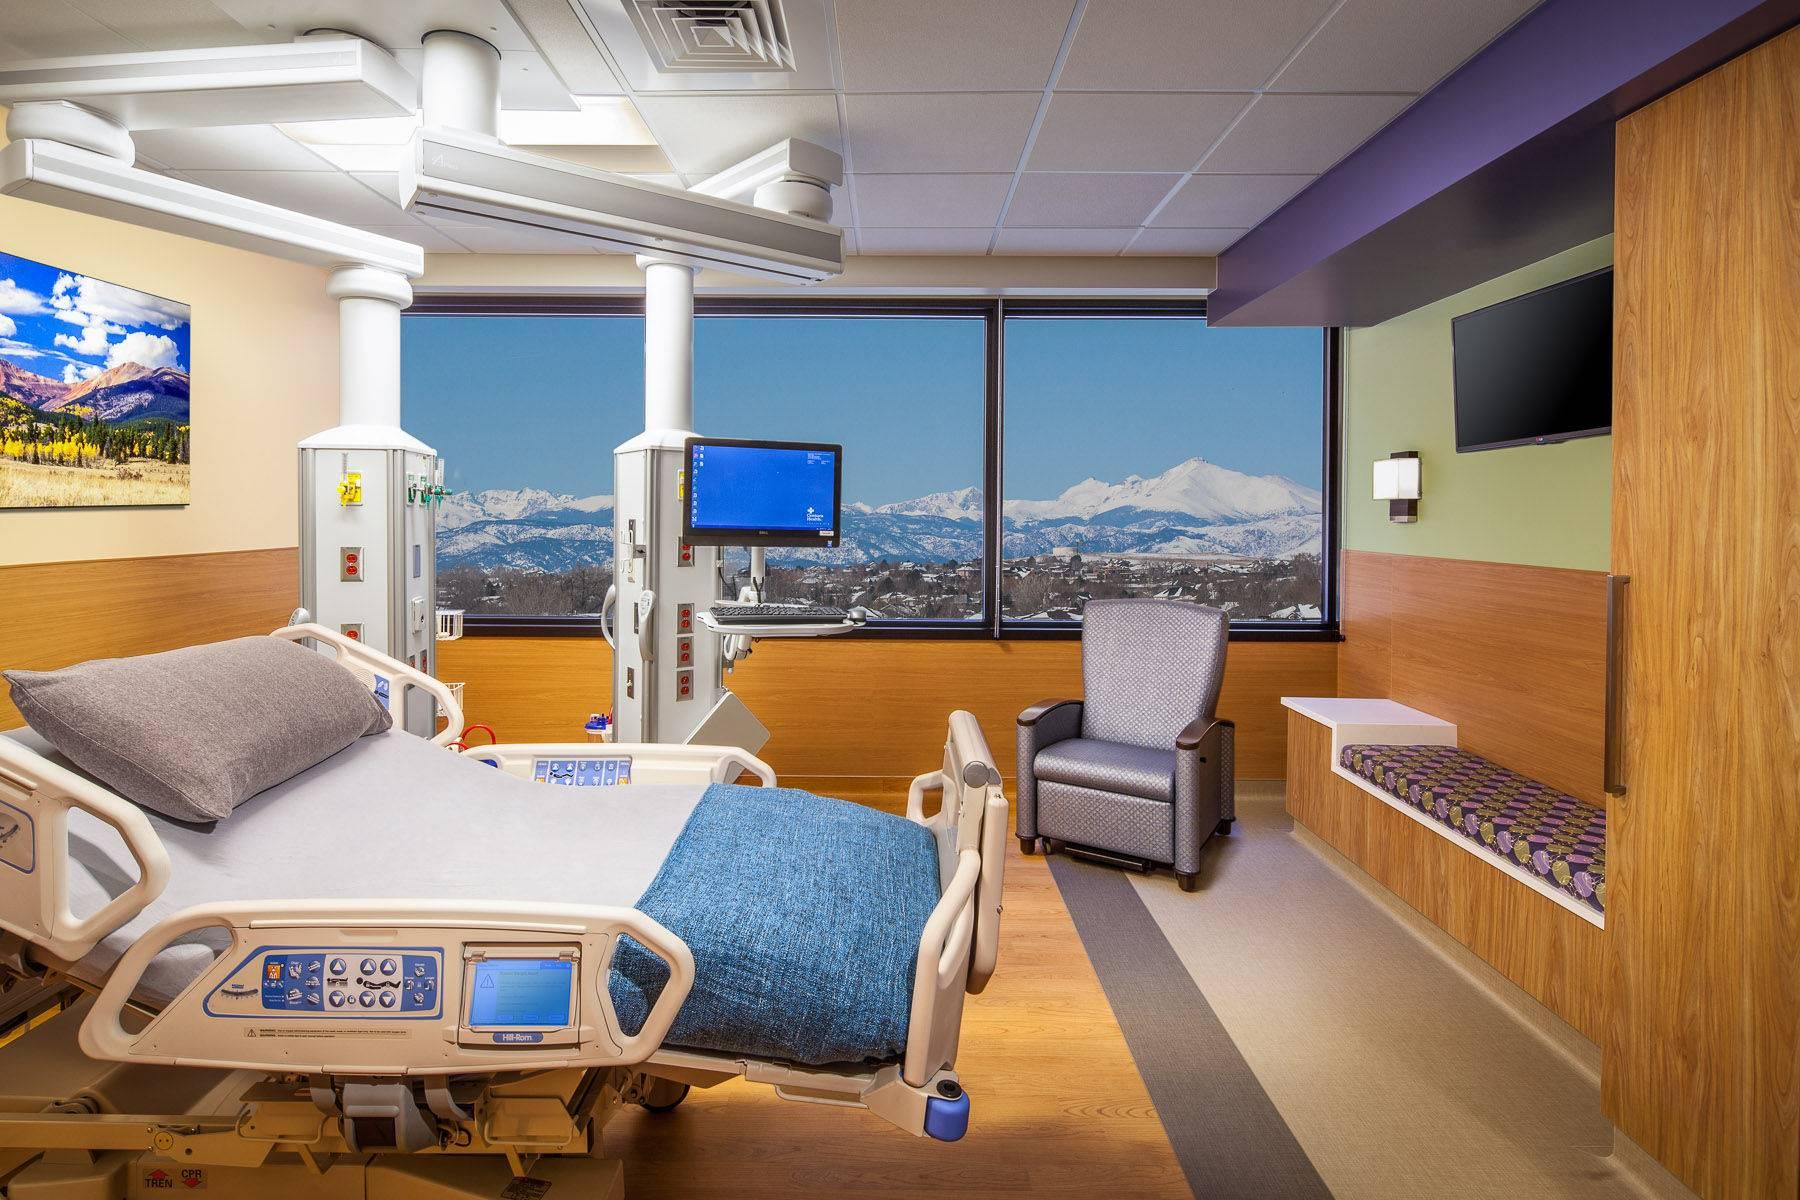 12_1r20150224_st_anthony_health_icu_rm.jpg